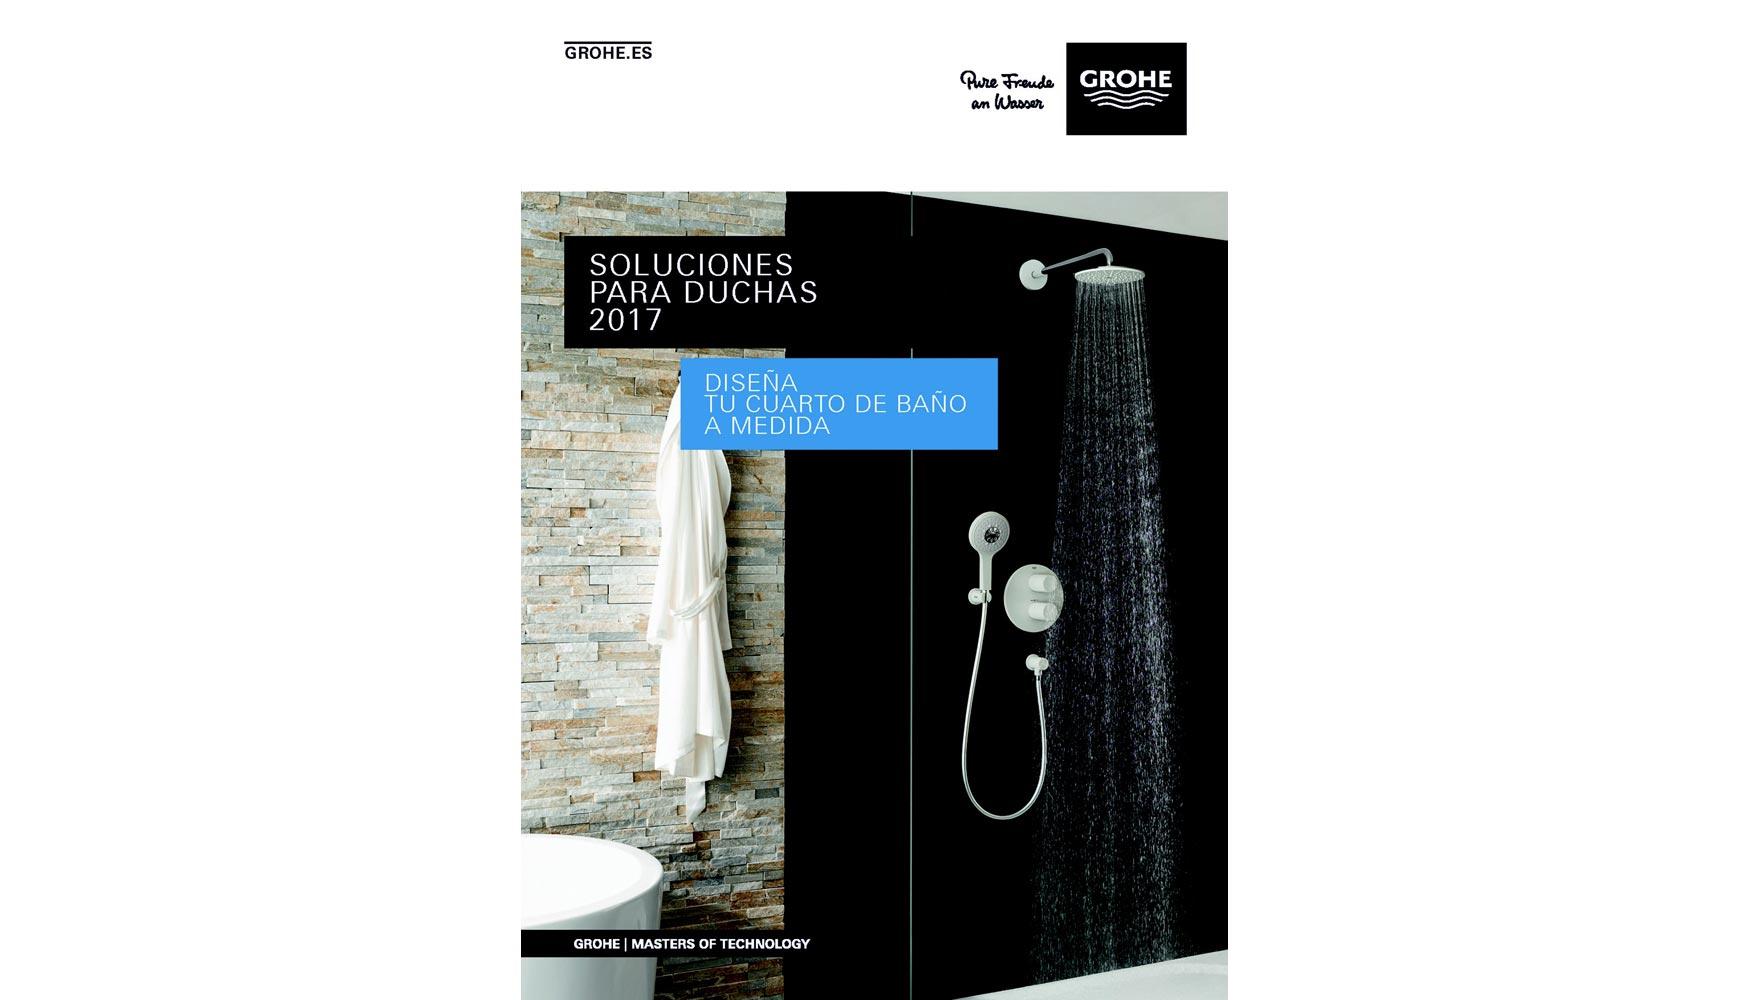 Grohe lanza su nueva tarifa de duchas 2017 decoraci n e for Tarifa grohe